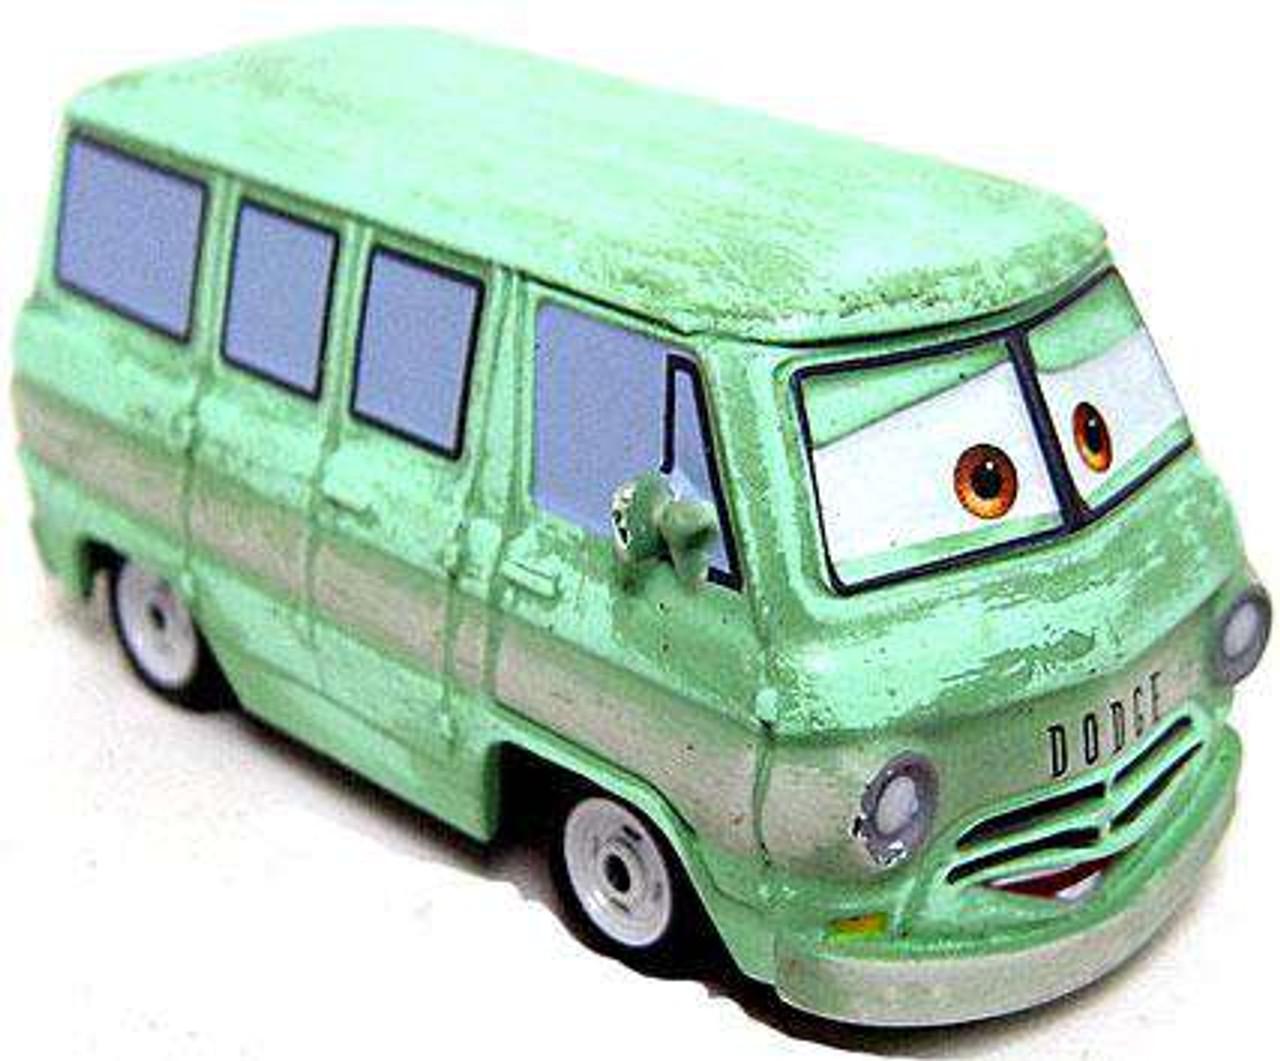 Disney Pixar Cars The World of Cars Movie Moments Rusty